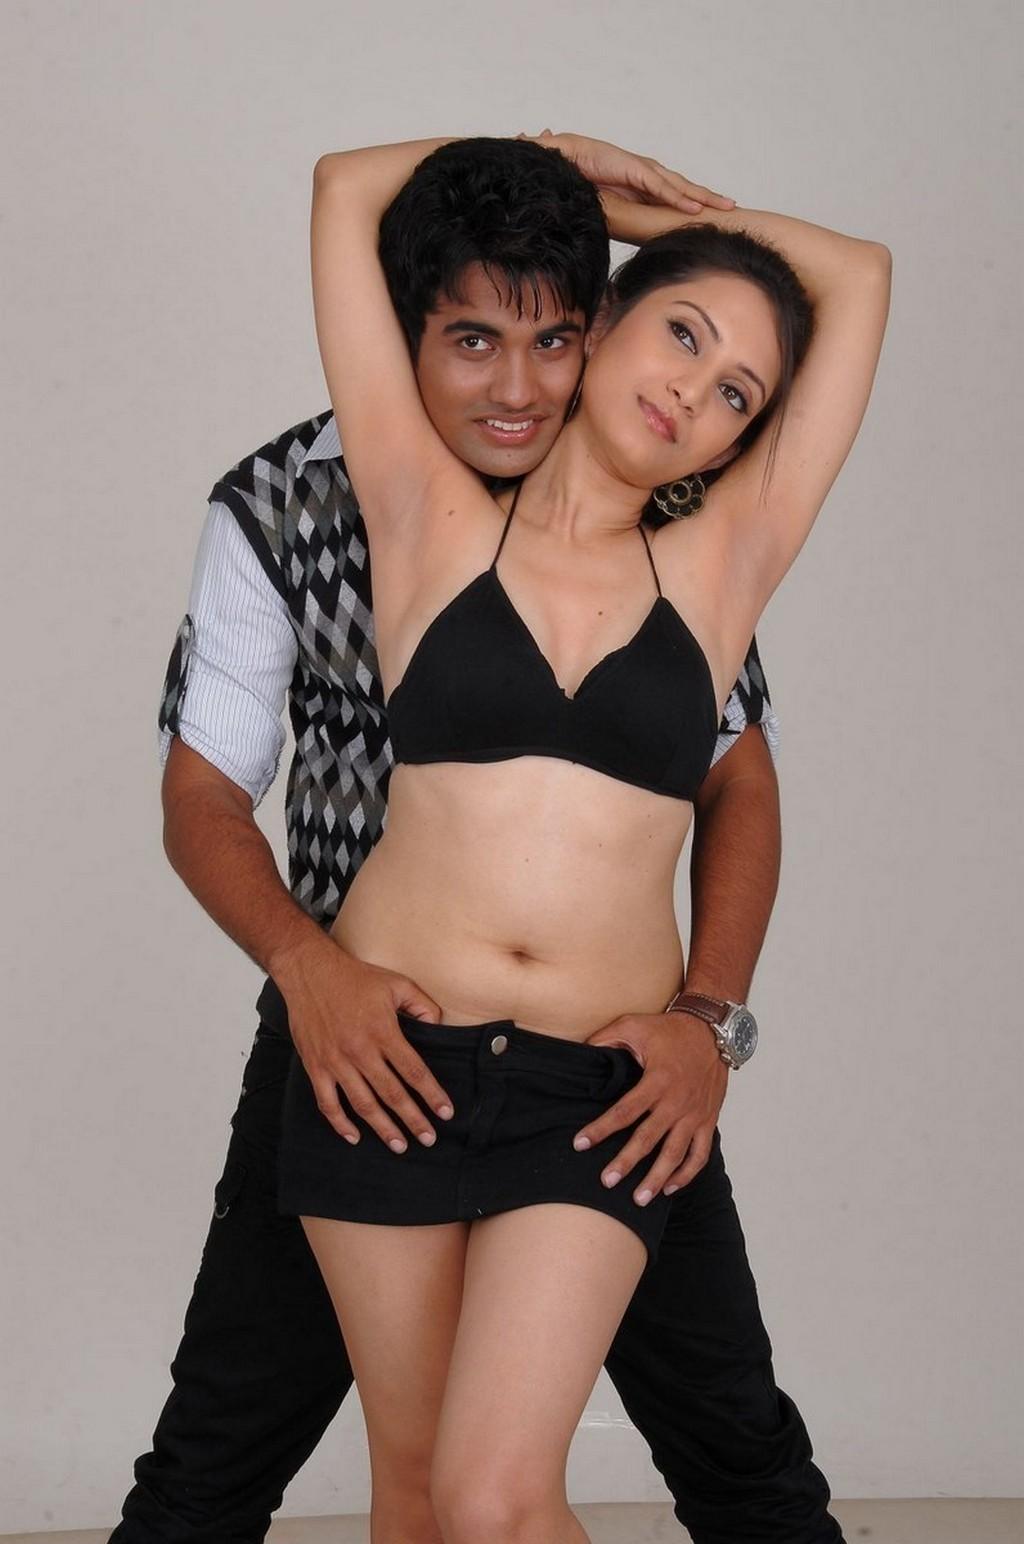 Telugu Movie Hot Photos Stills - Shiner Photos-2249